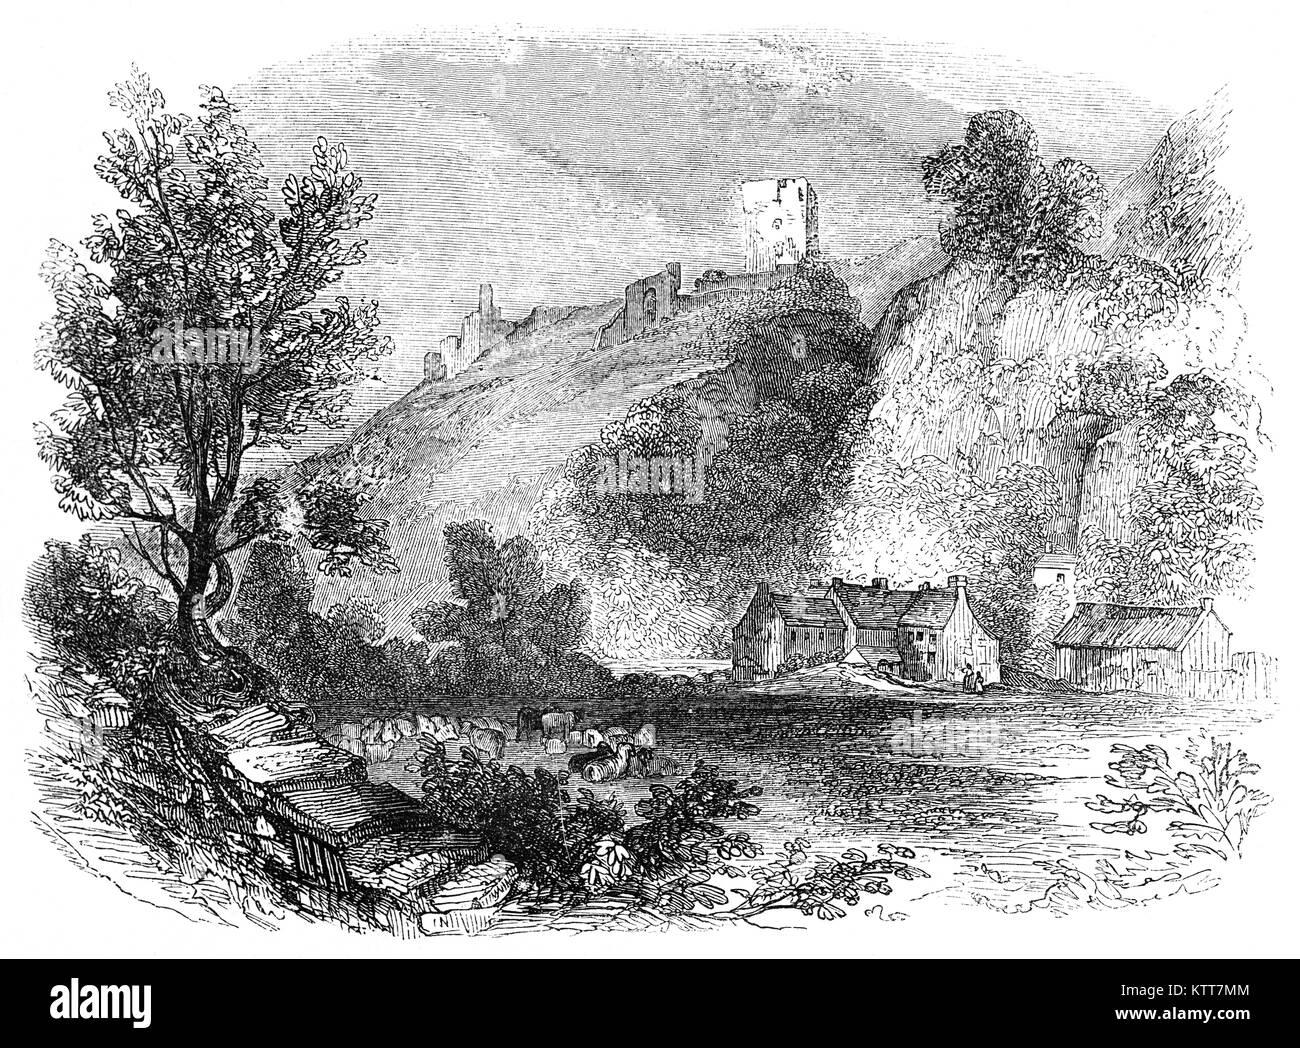 Peveril Castle (also Castleton Castle or Peak Castle) is a ruined 11th-century castle overlooking the village of - Stock Image